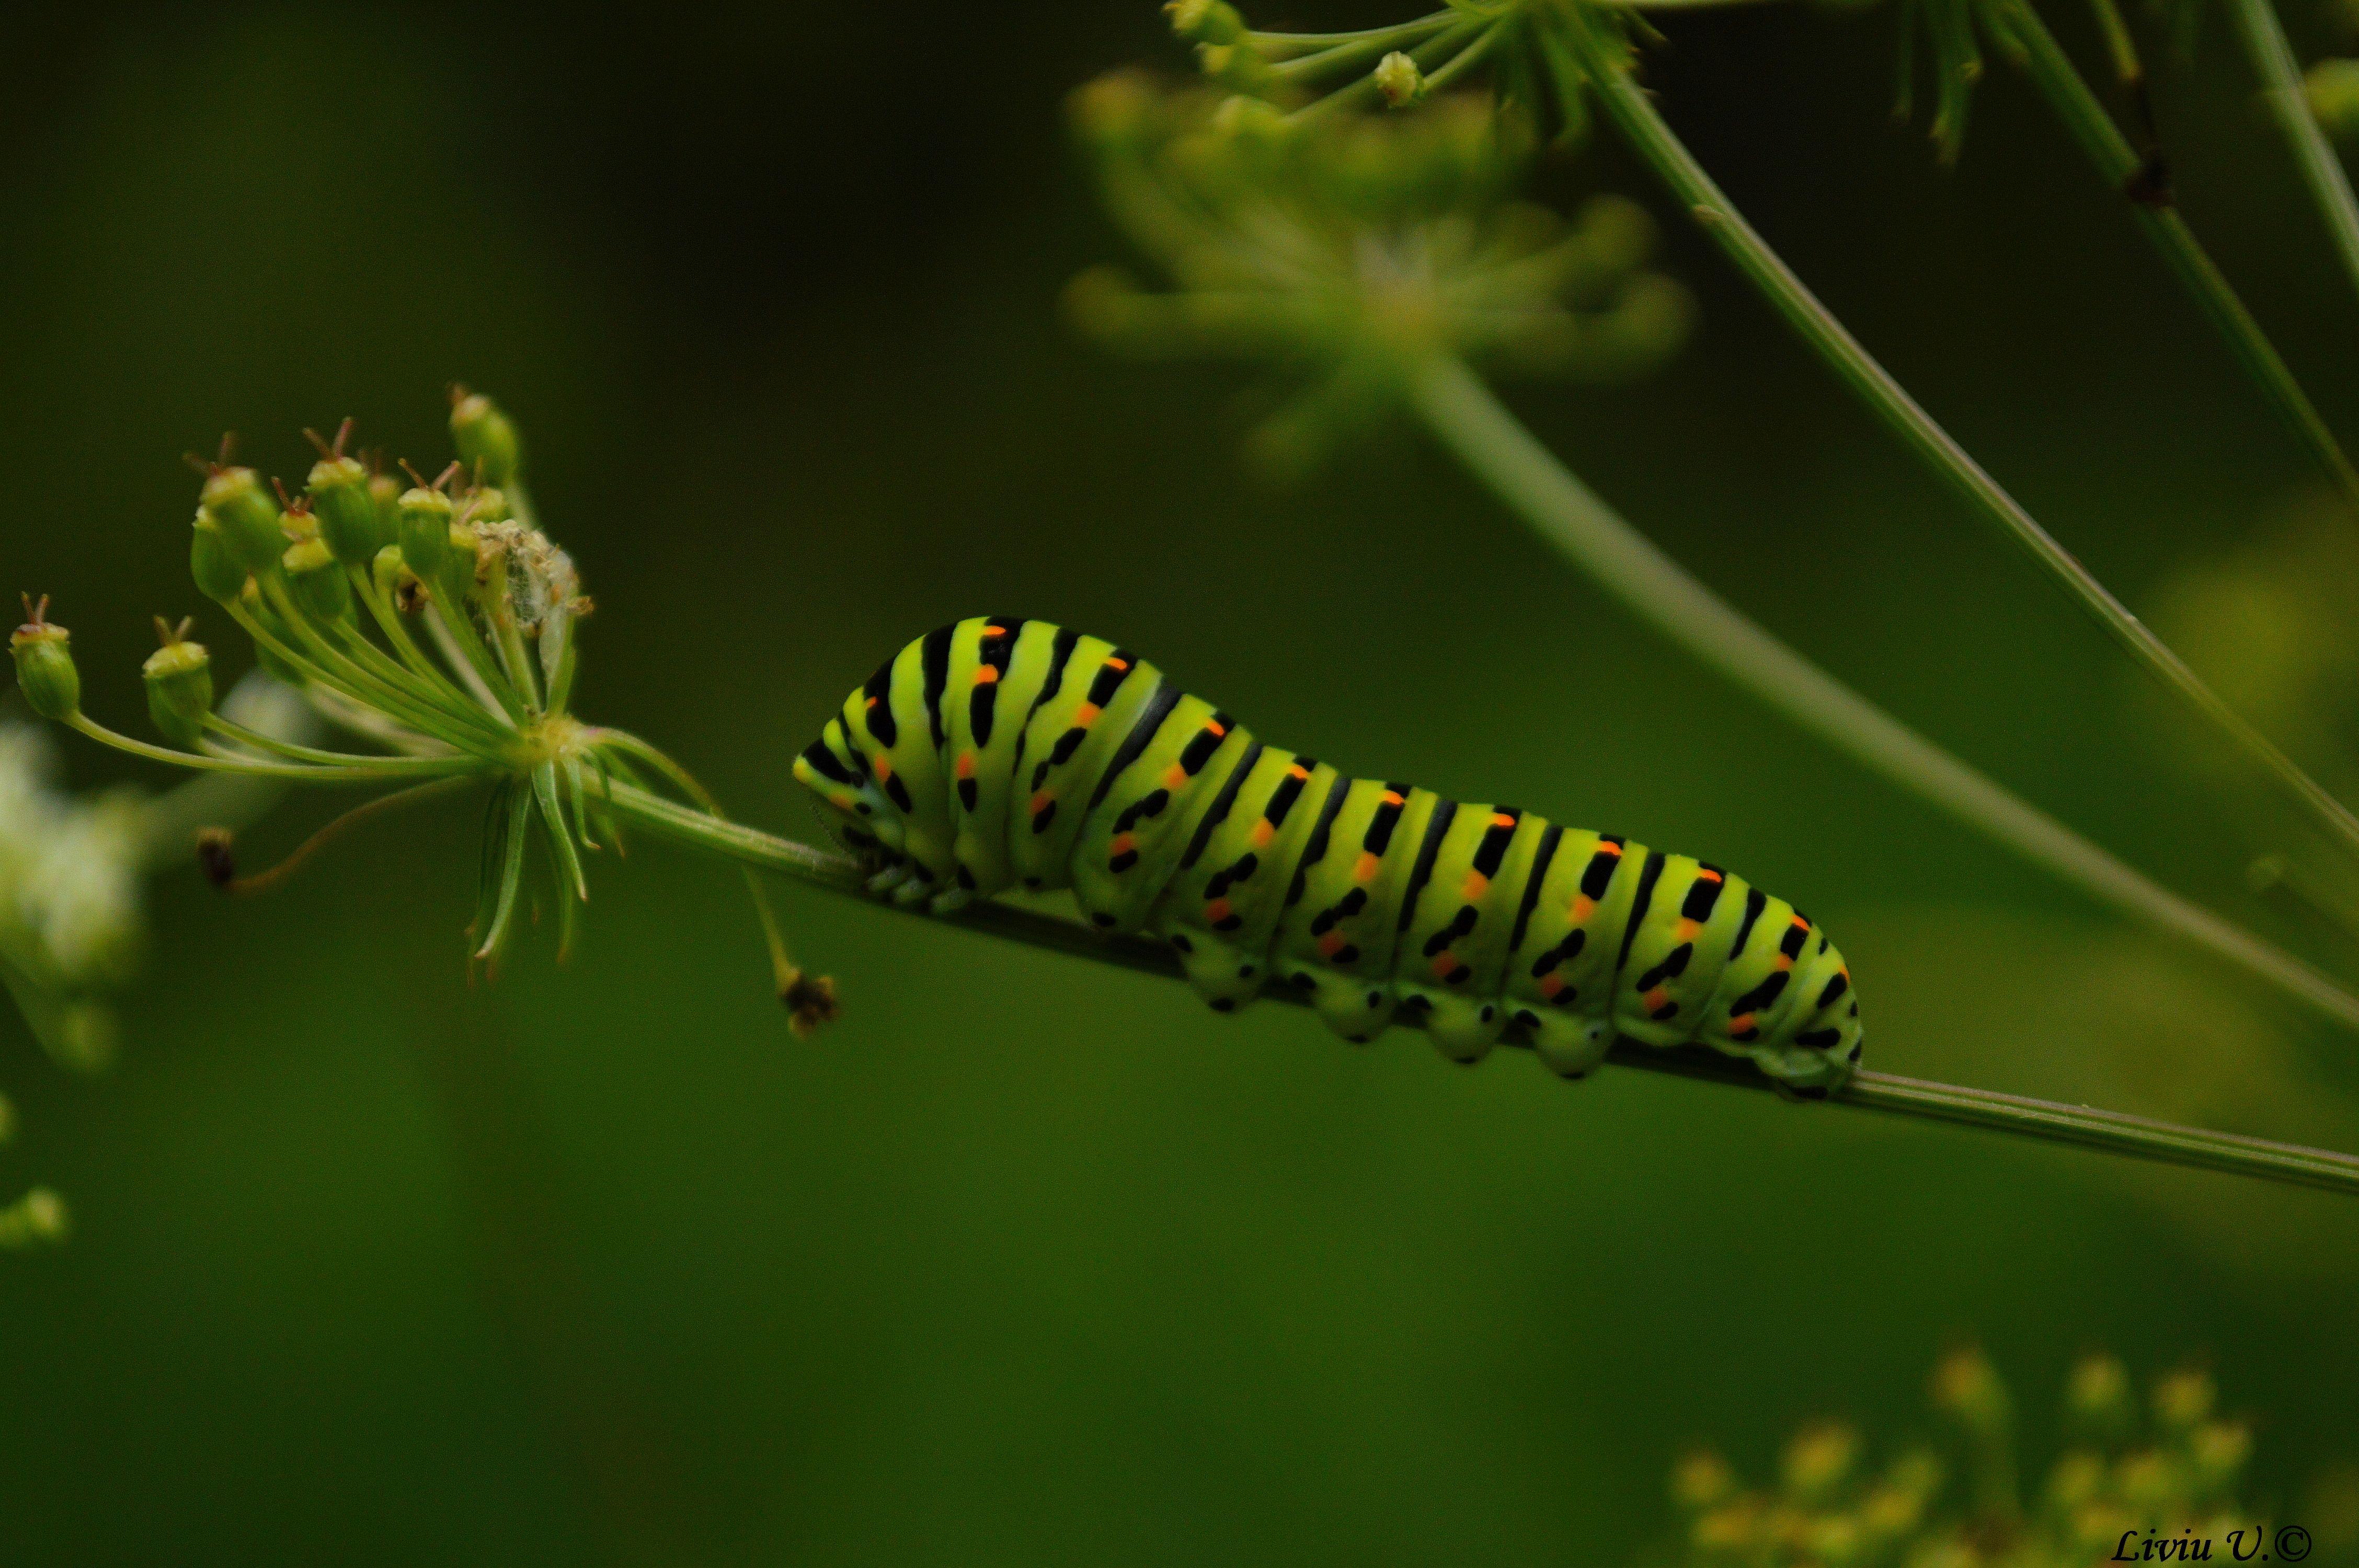 Papilio machaon catterpilar, butterfly, catterpilar, Dumbrava Vadului, Sercaia